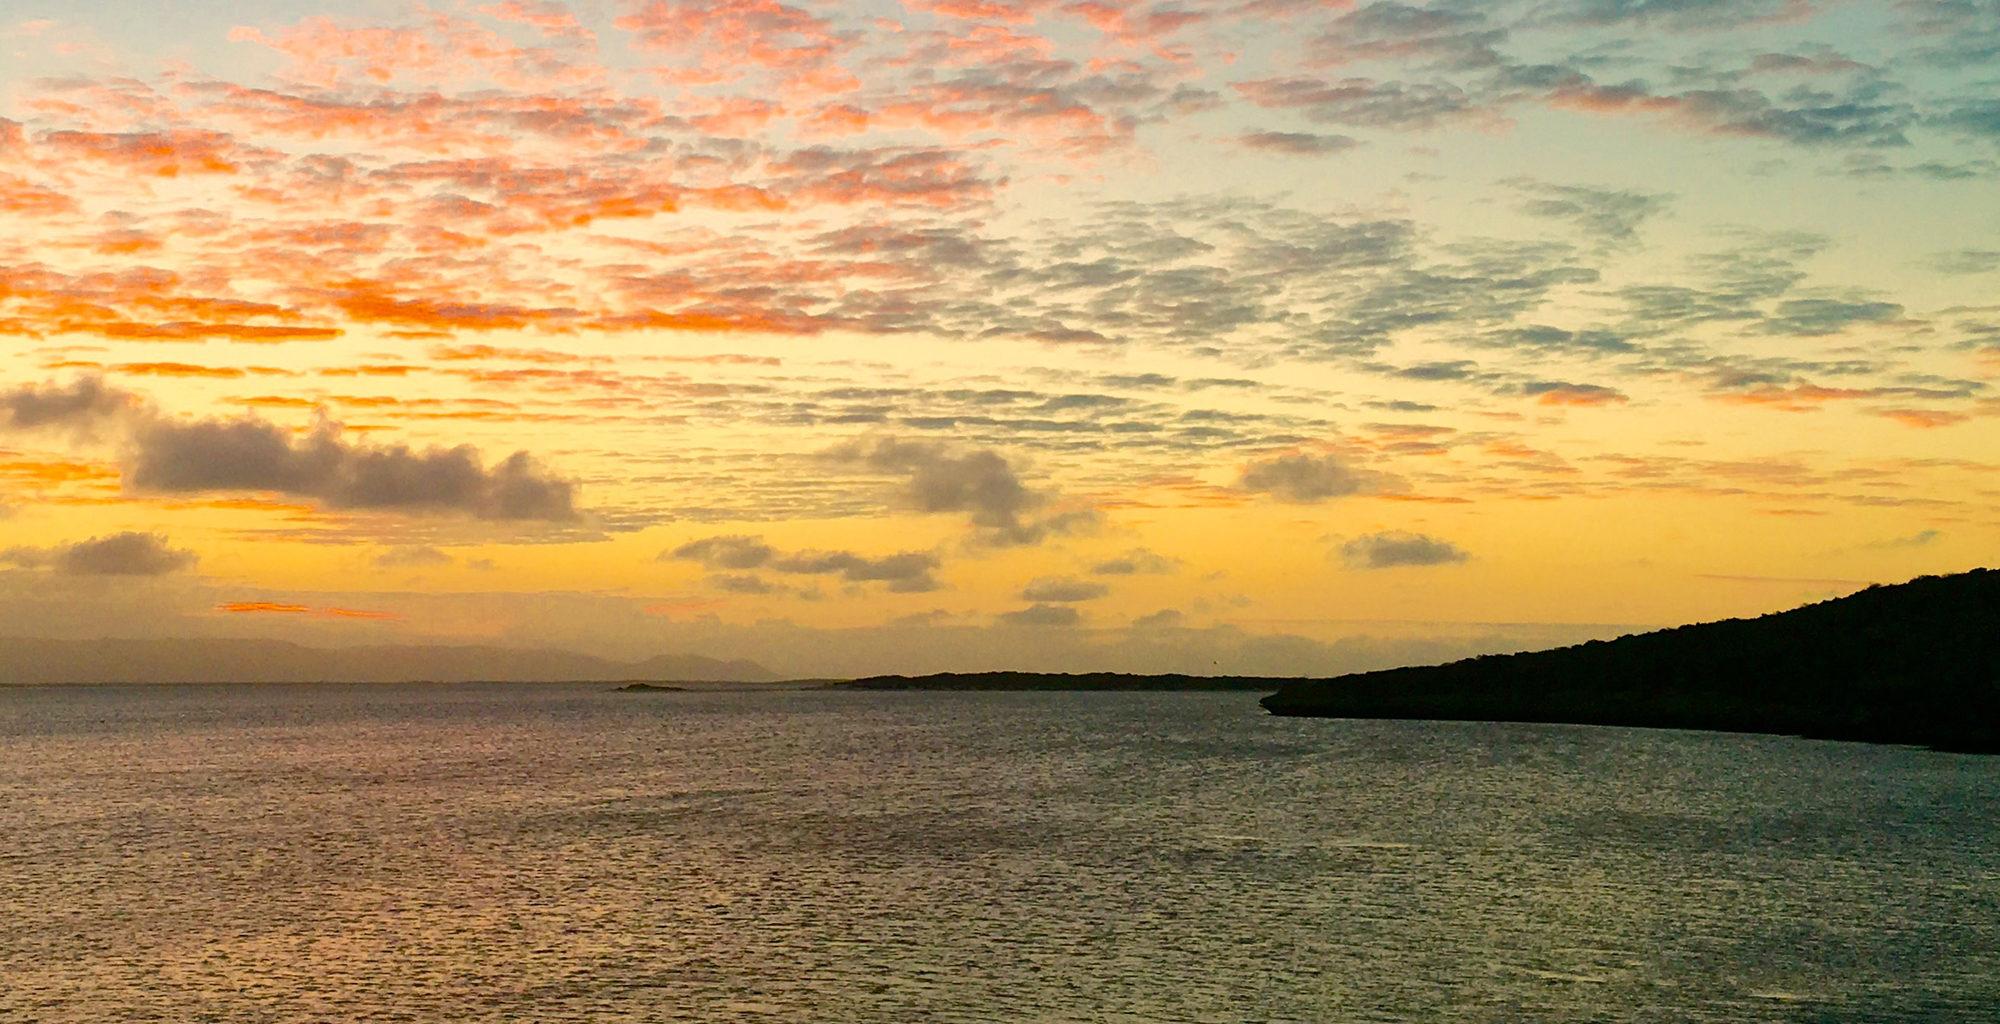 North-Madagascar-Sunset-Seascape